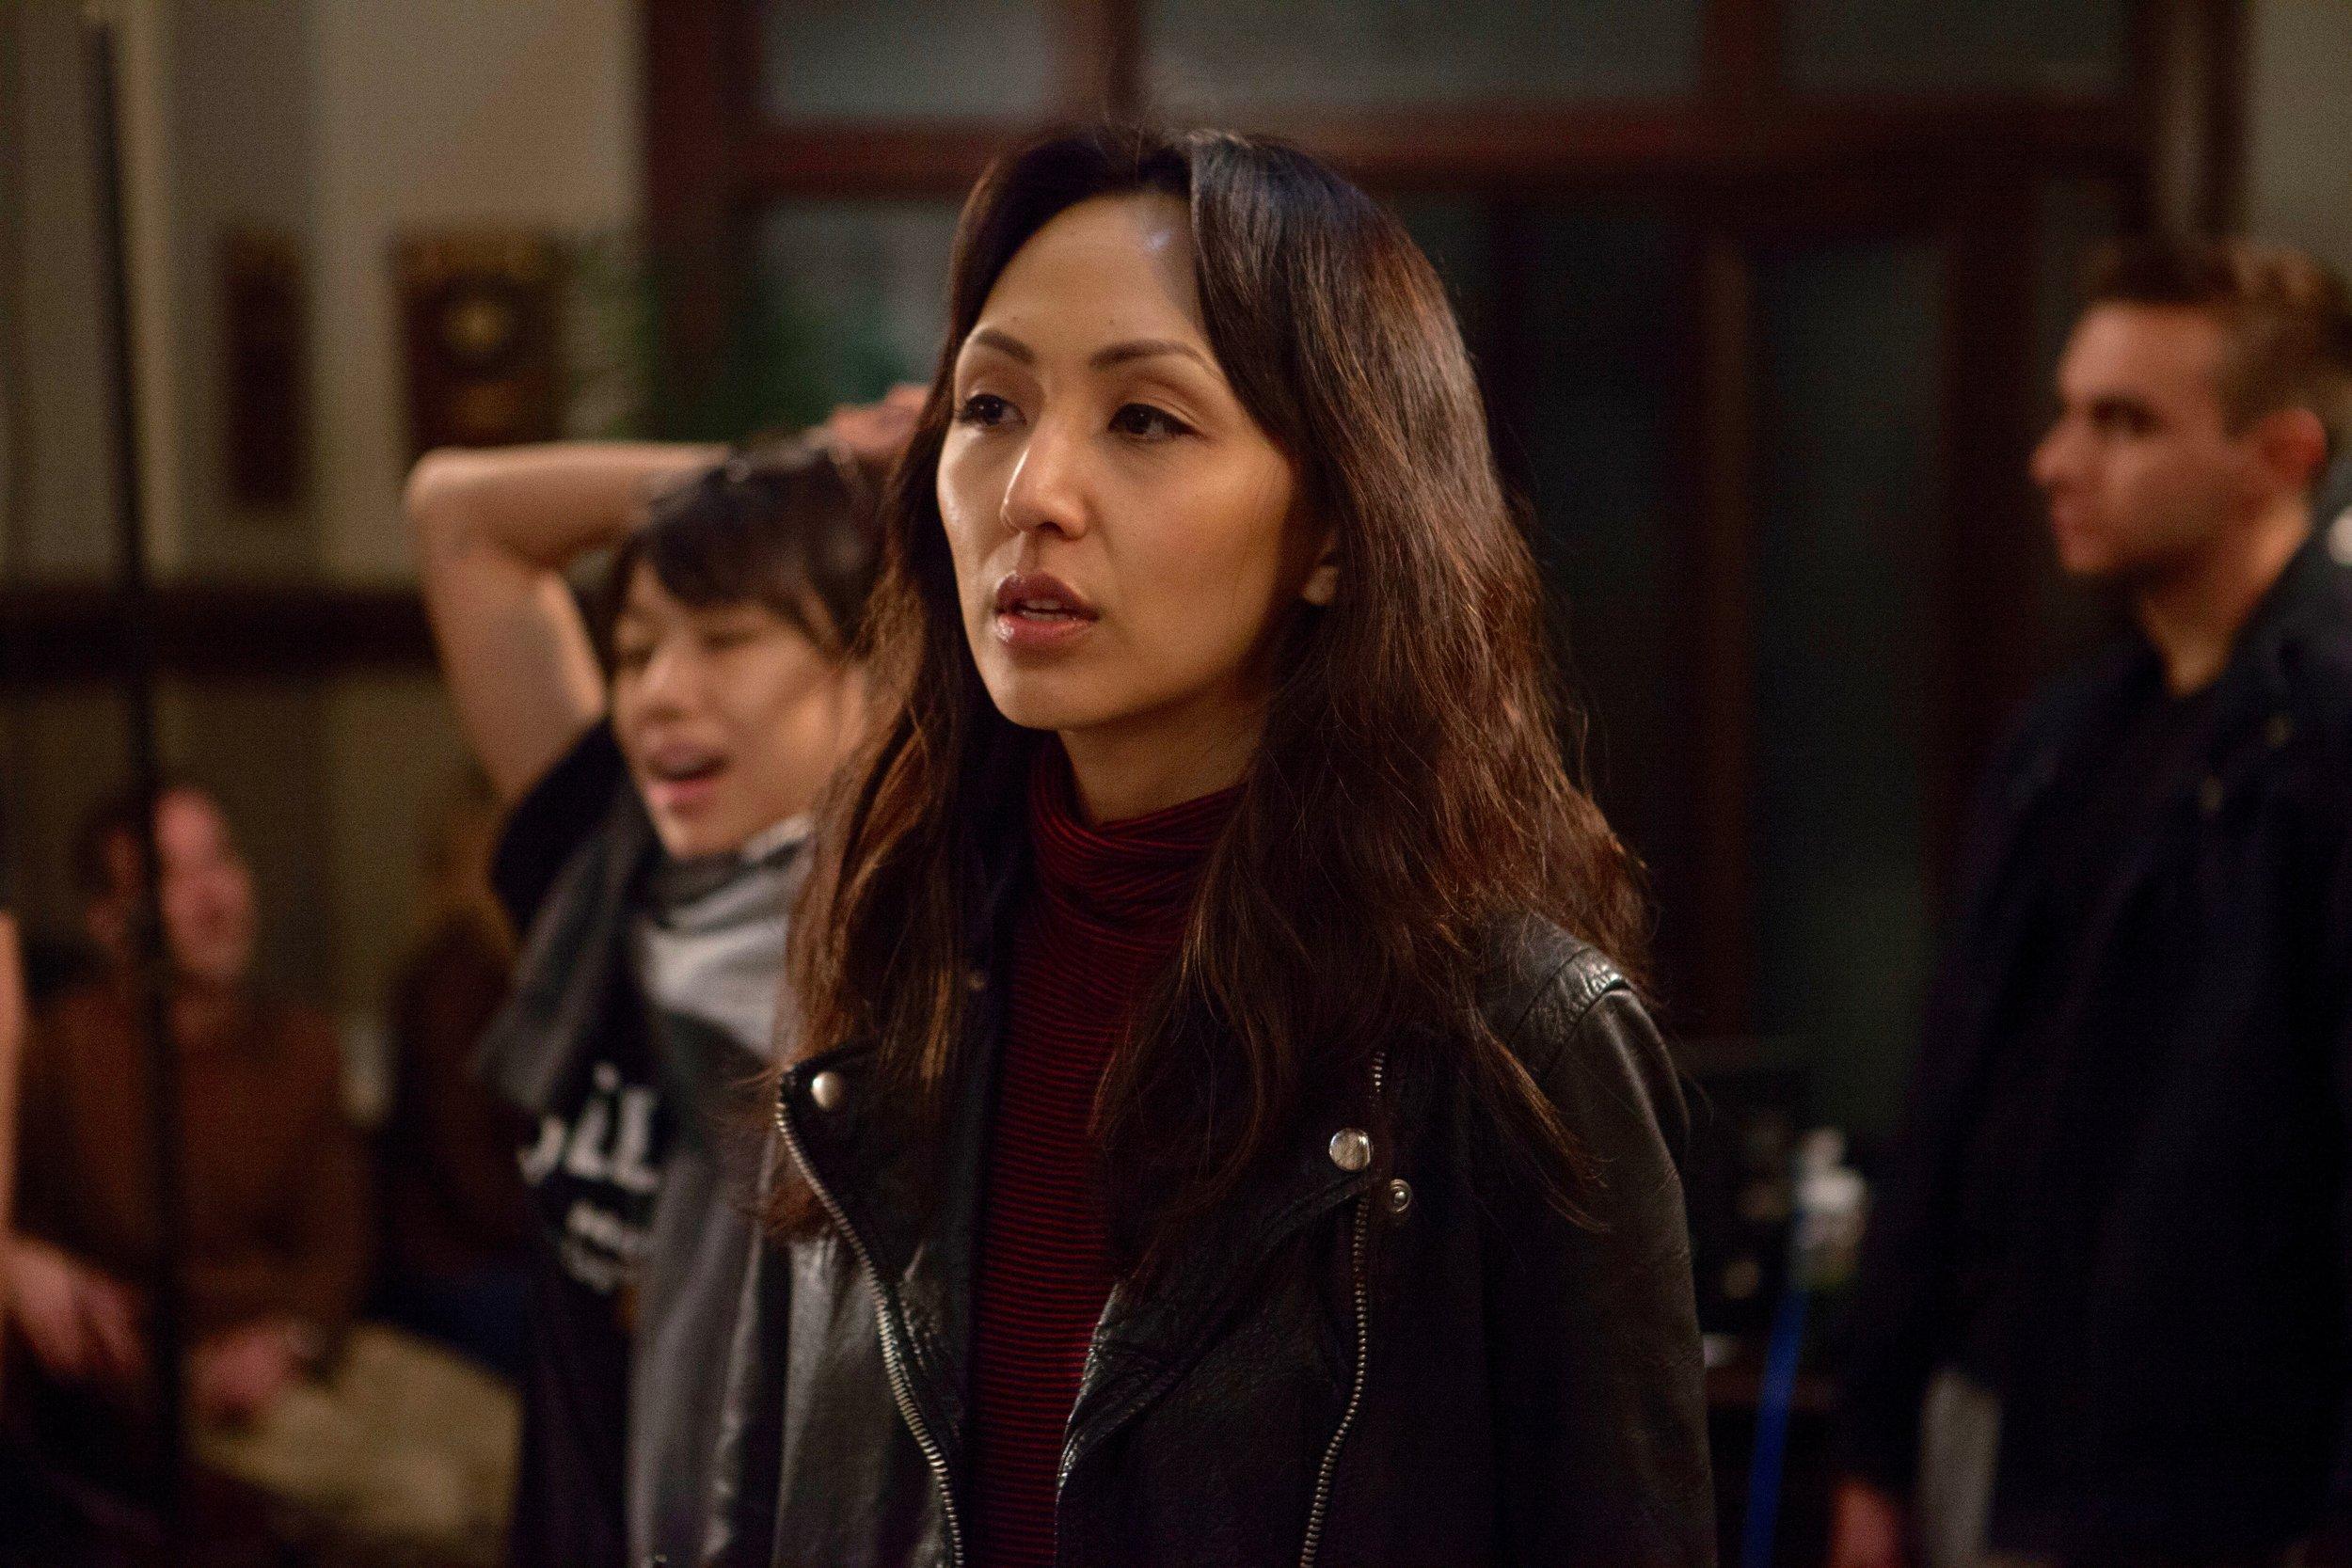 "1/16/16 Cops & Bottoms Production Office Scene. Linda Park as ""Jennifer"""